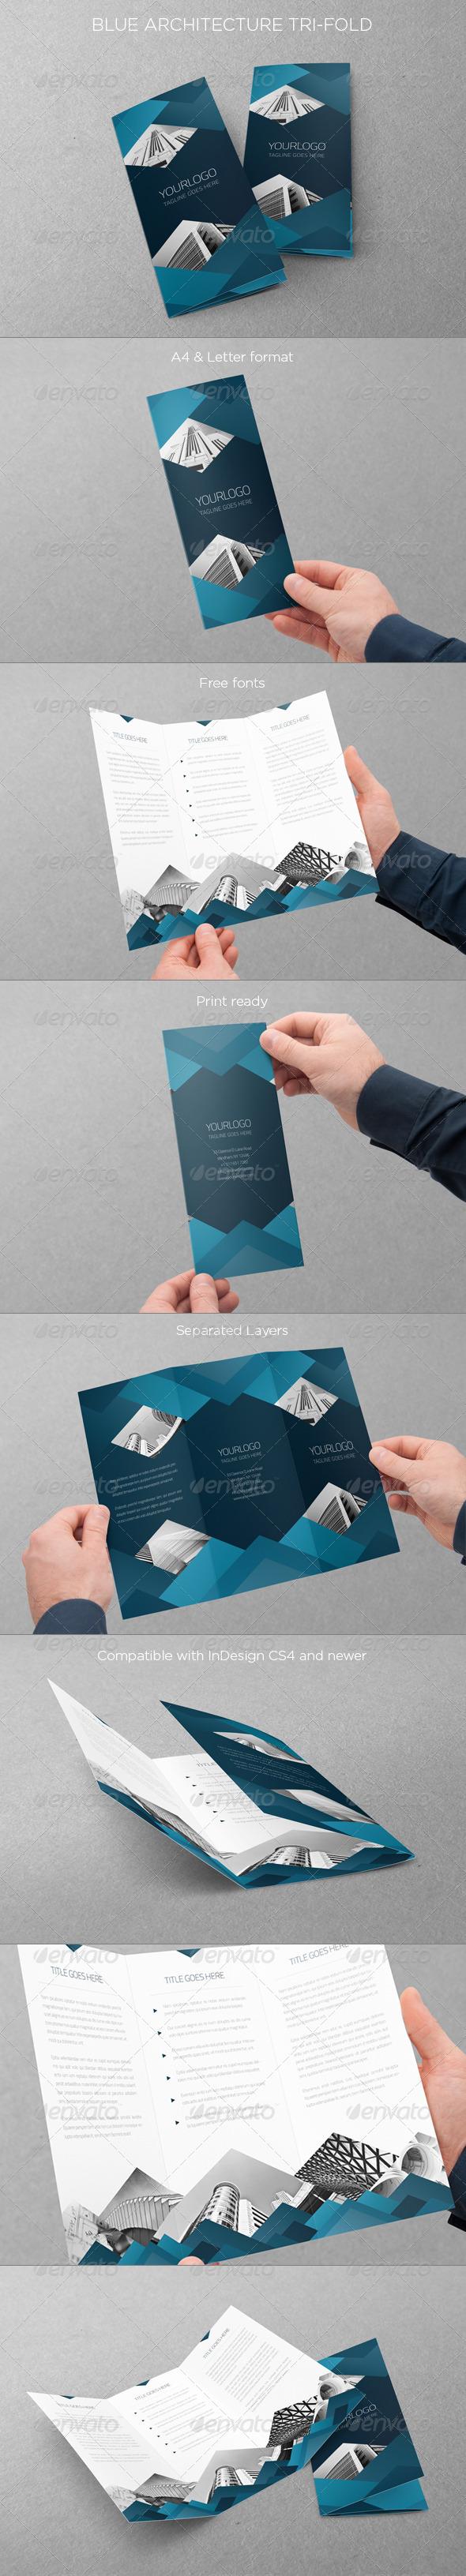 Blue Architecture Trifold - Brochures Print Templates